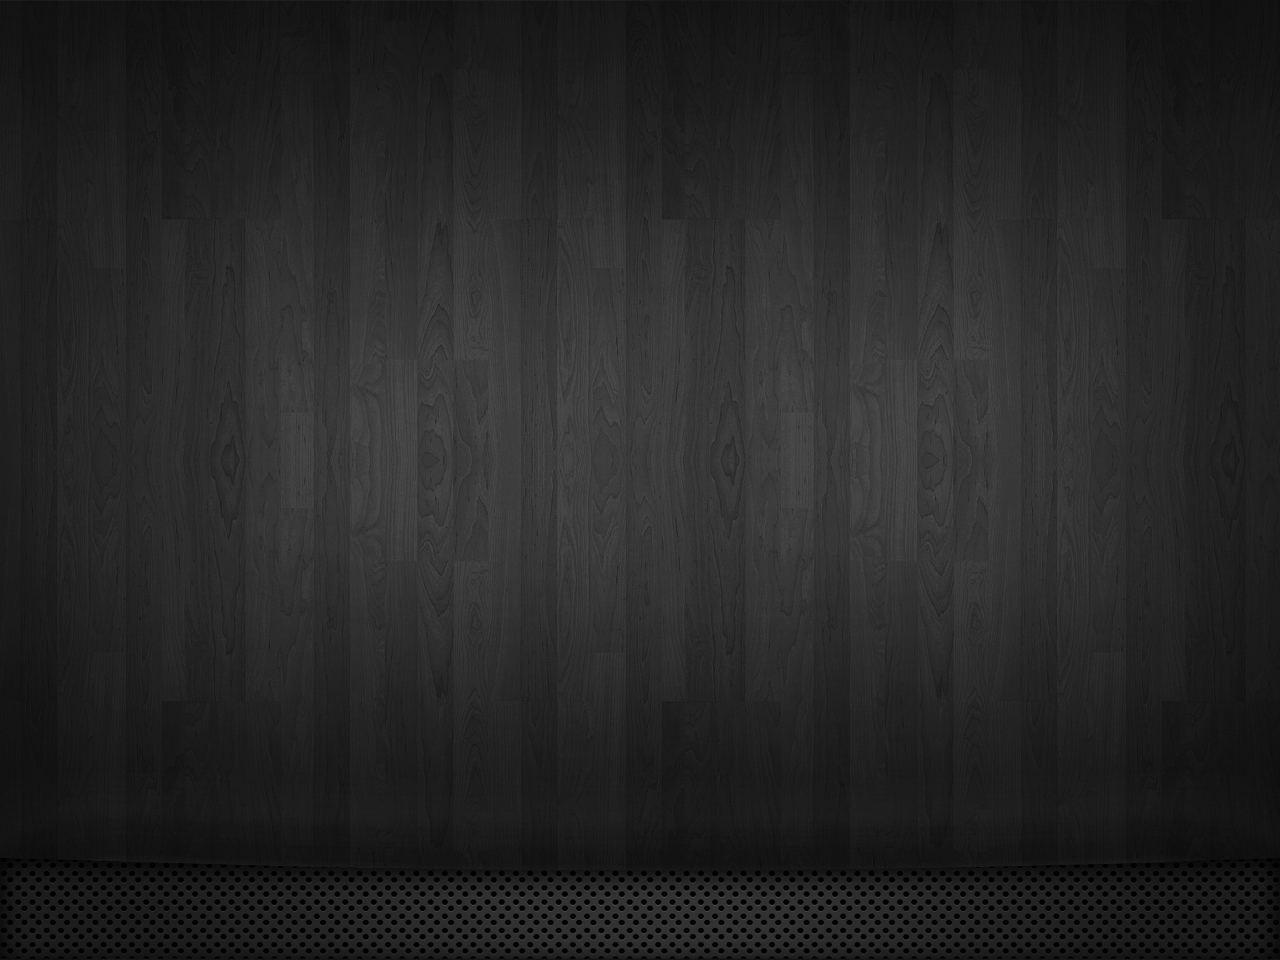 Stunning Black Backgrounds